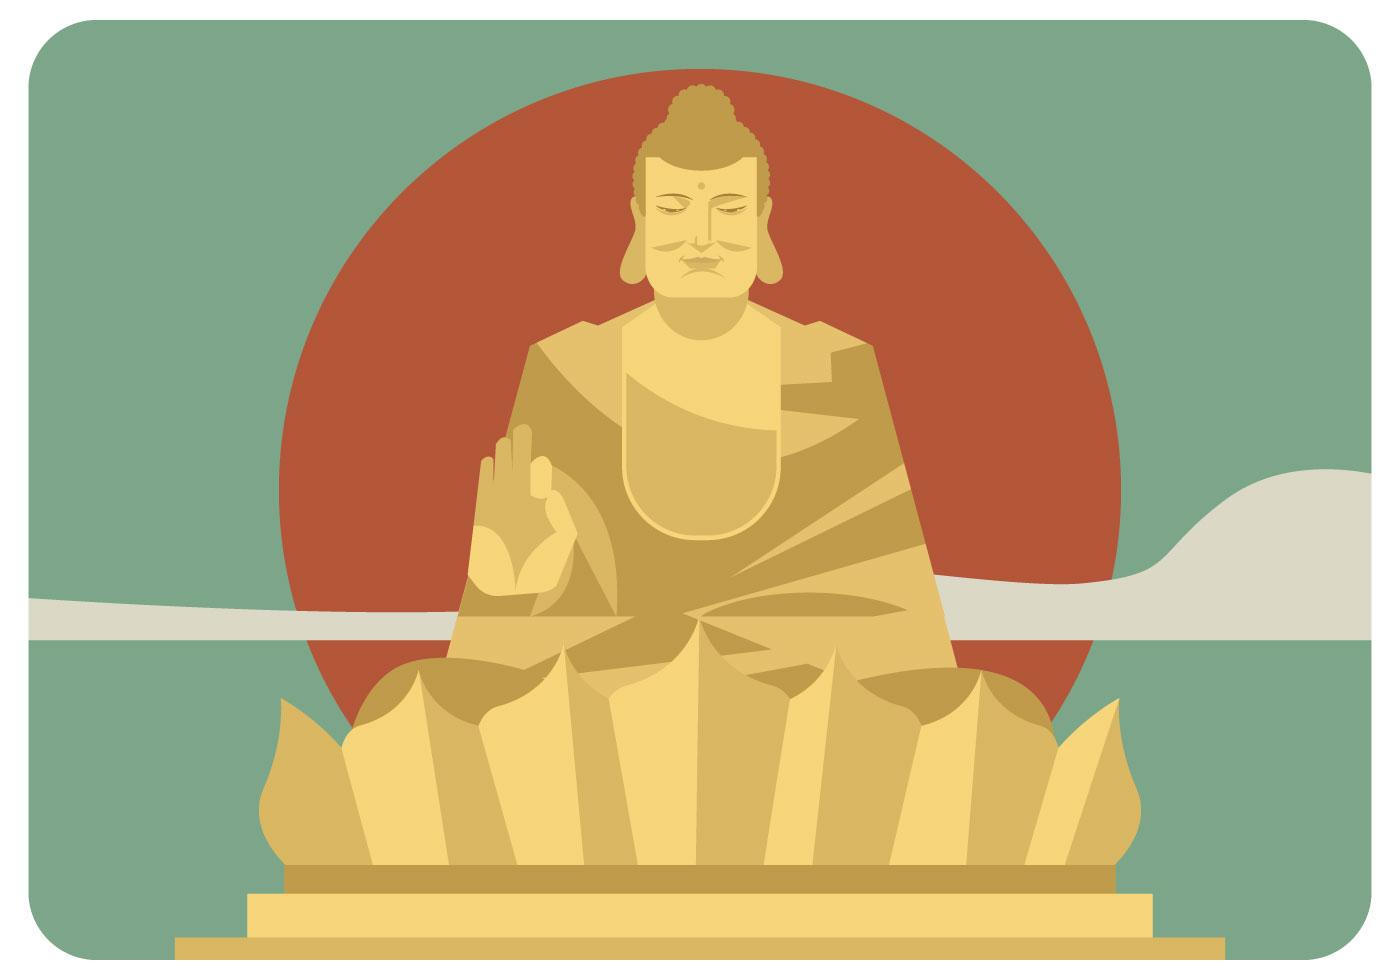 buddha free vector art 764 free downloads rh vecteezy com buddha vector free download buddha vector free